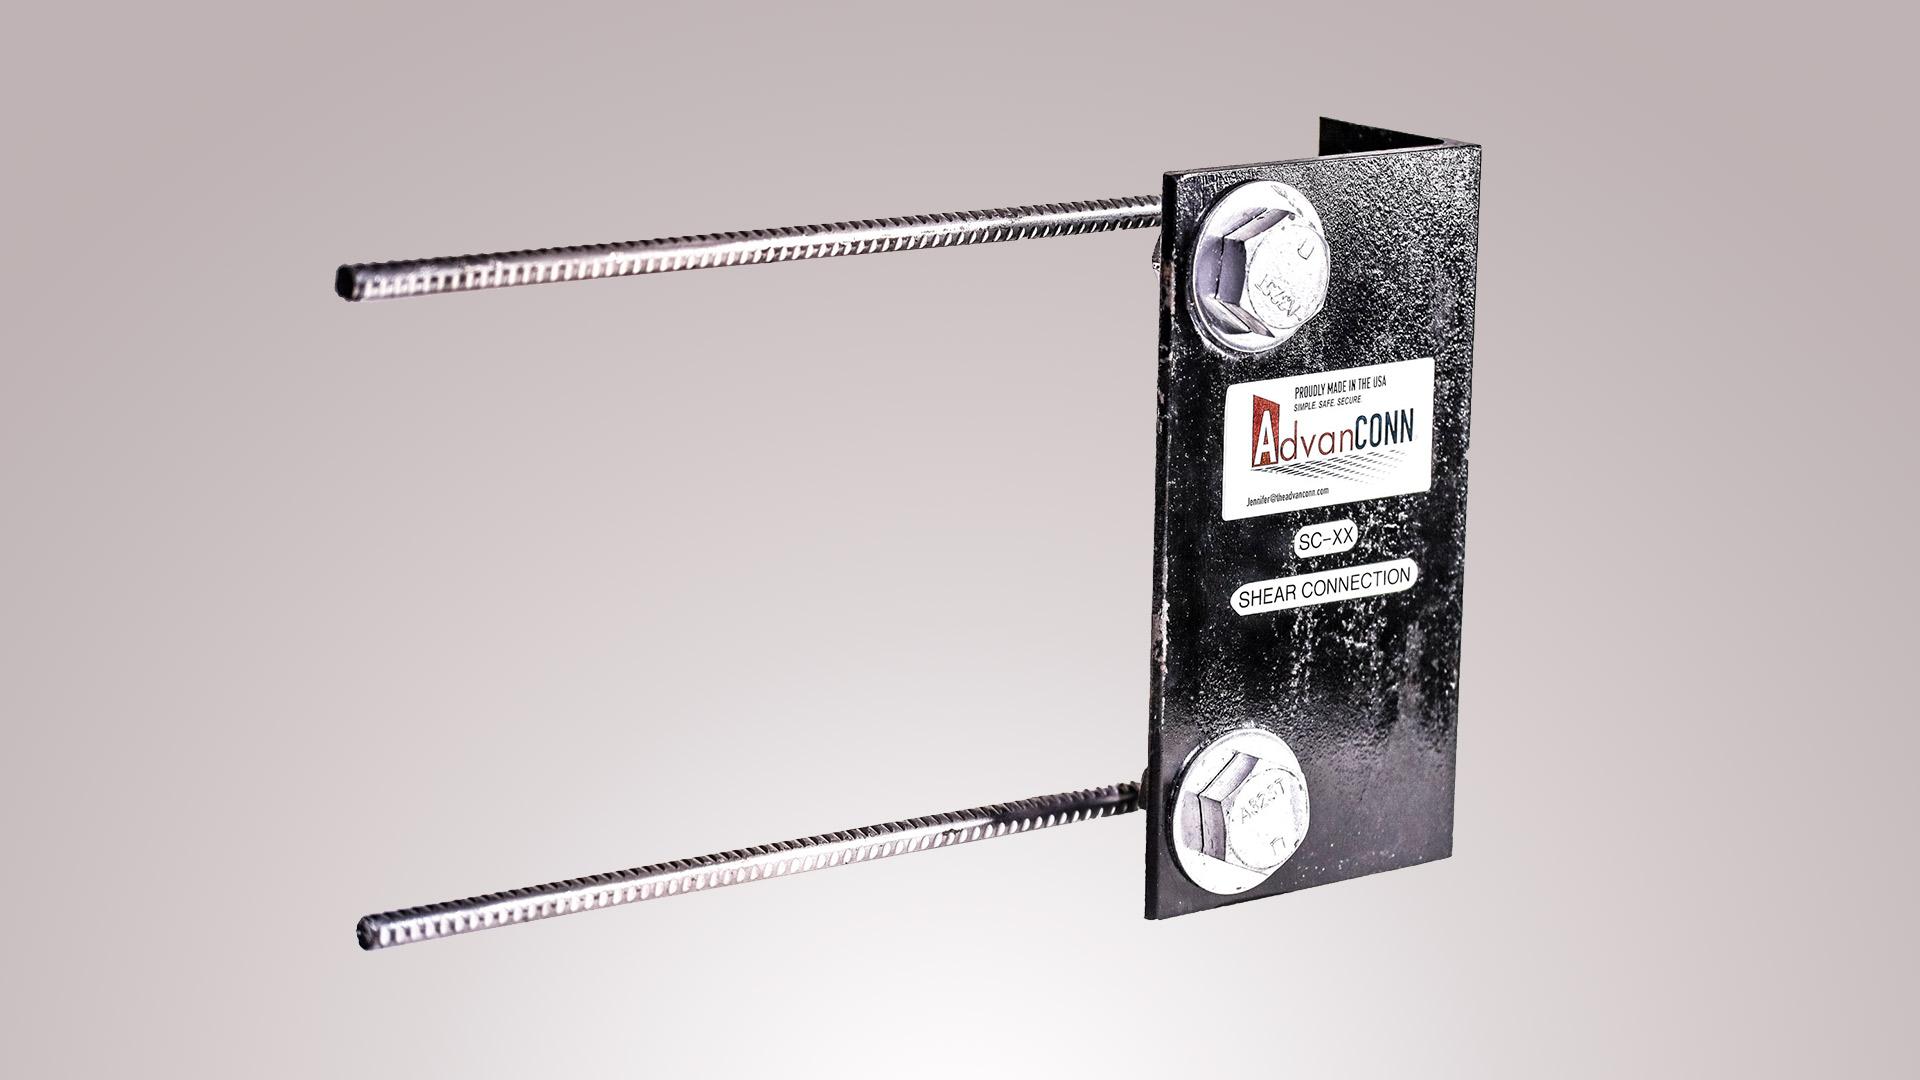 The AdvanConn shear connector